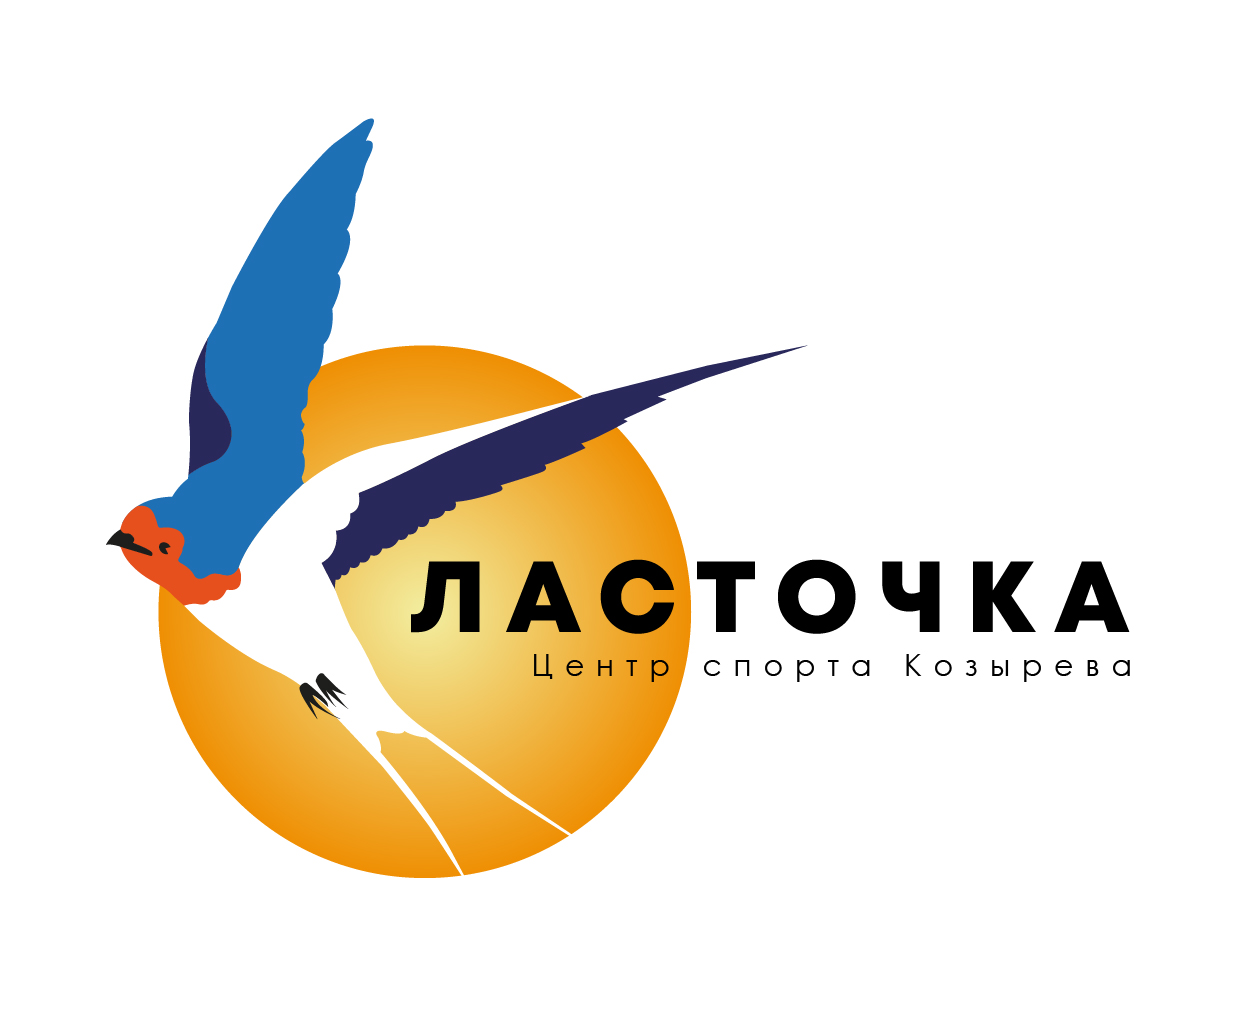 Ласточка (центр спорта Василия Козырева)